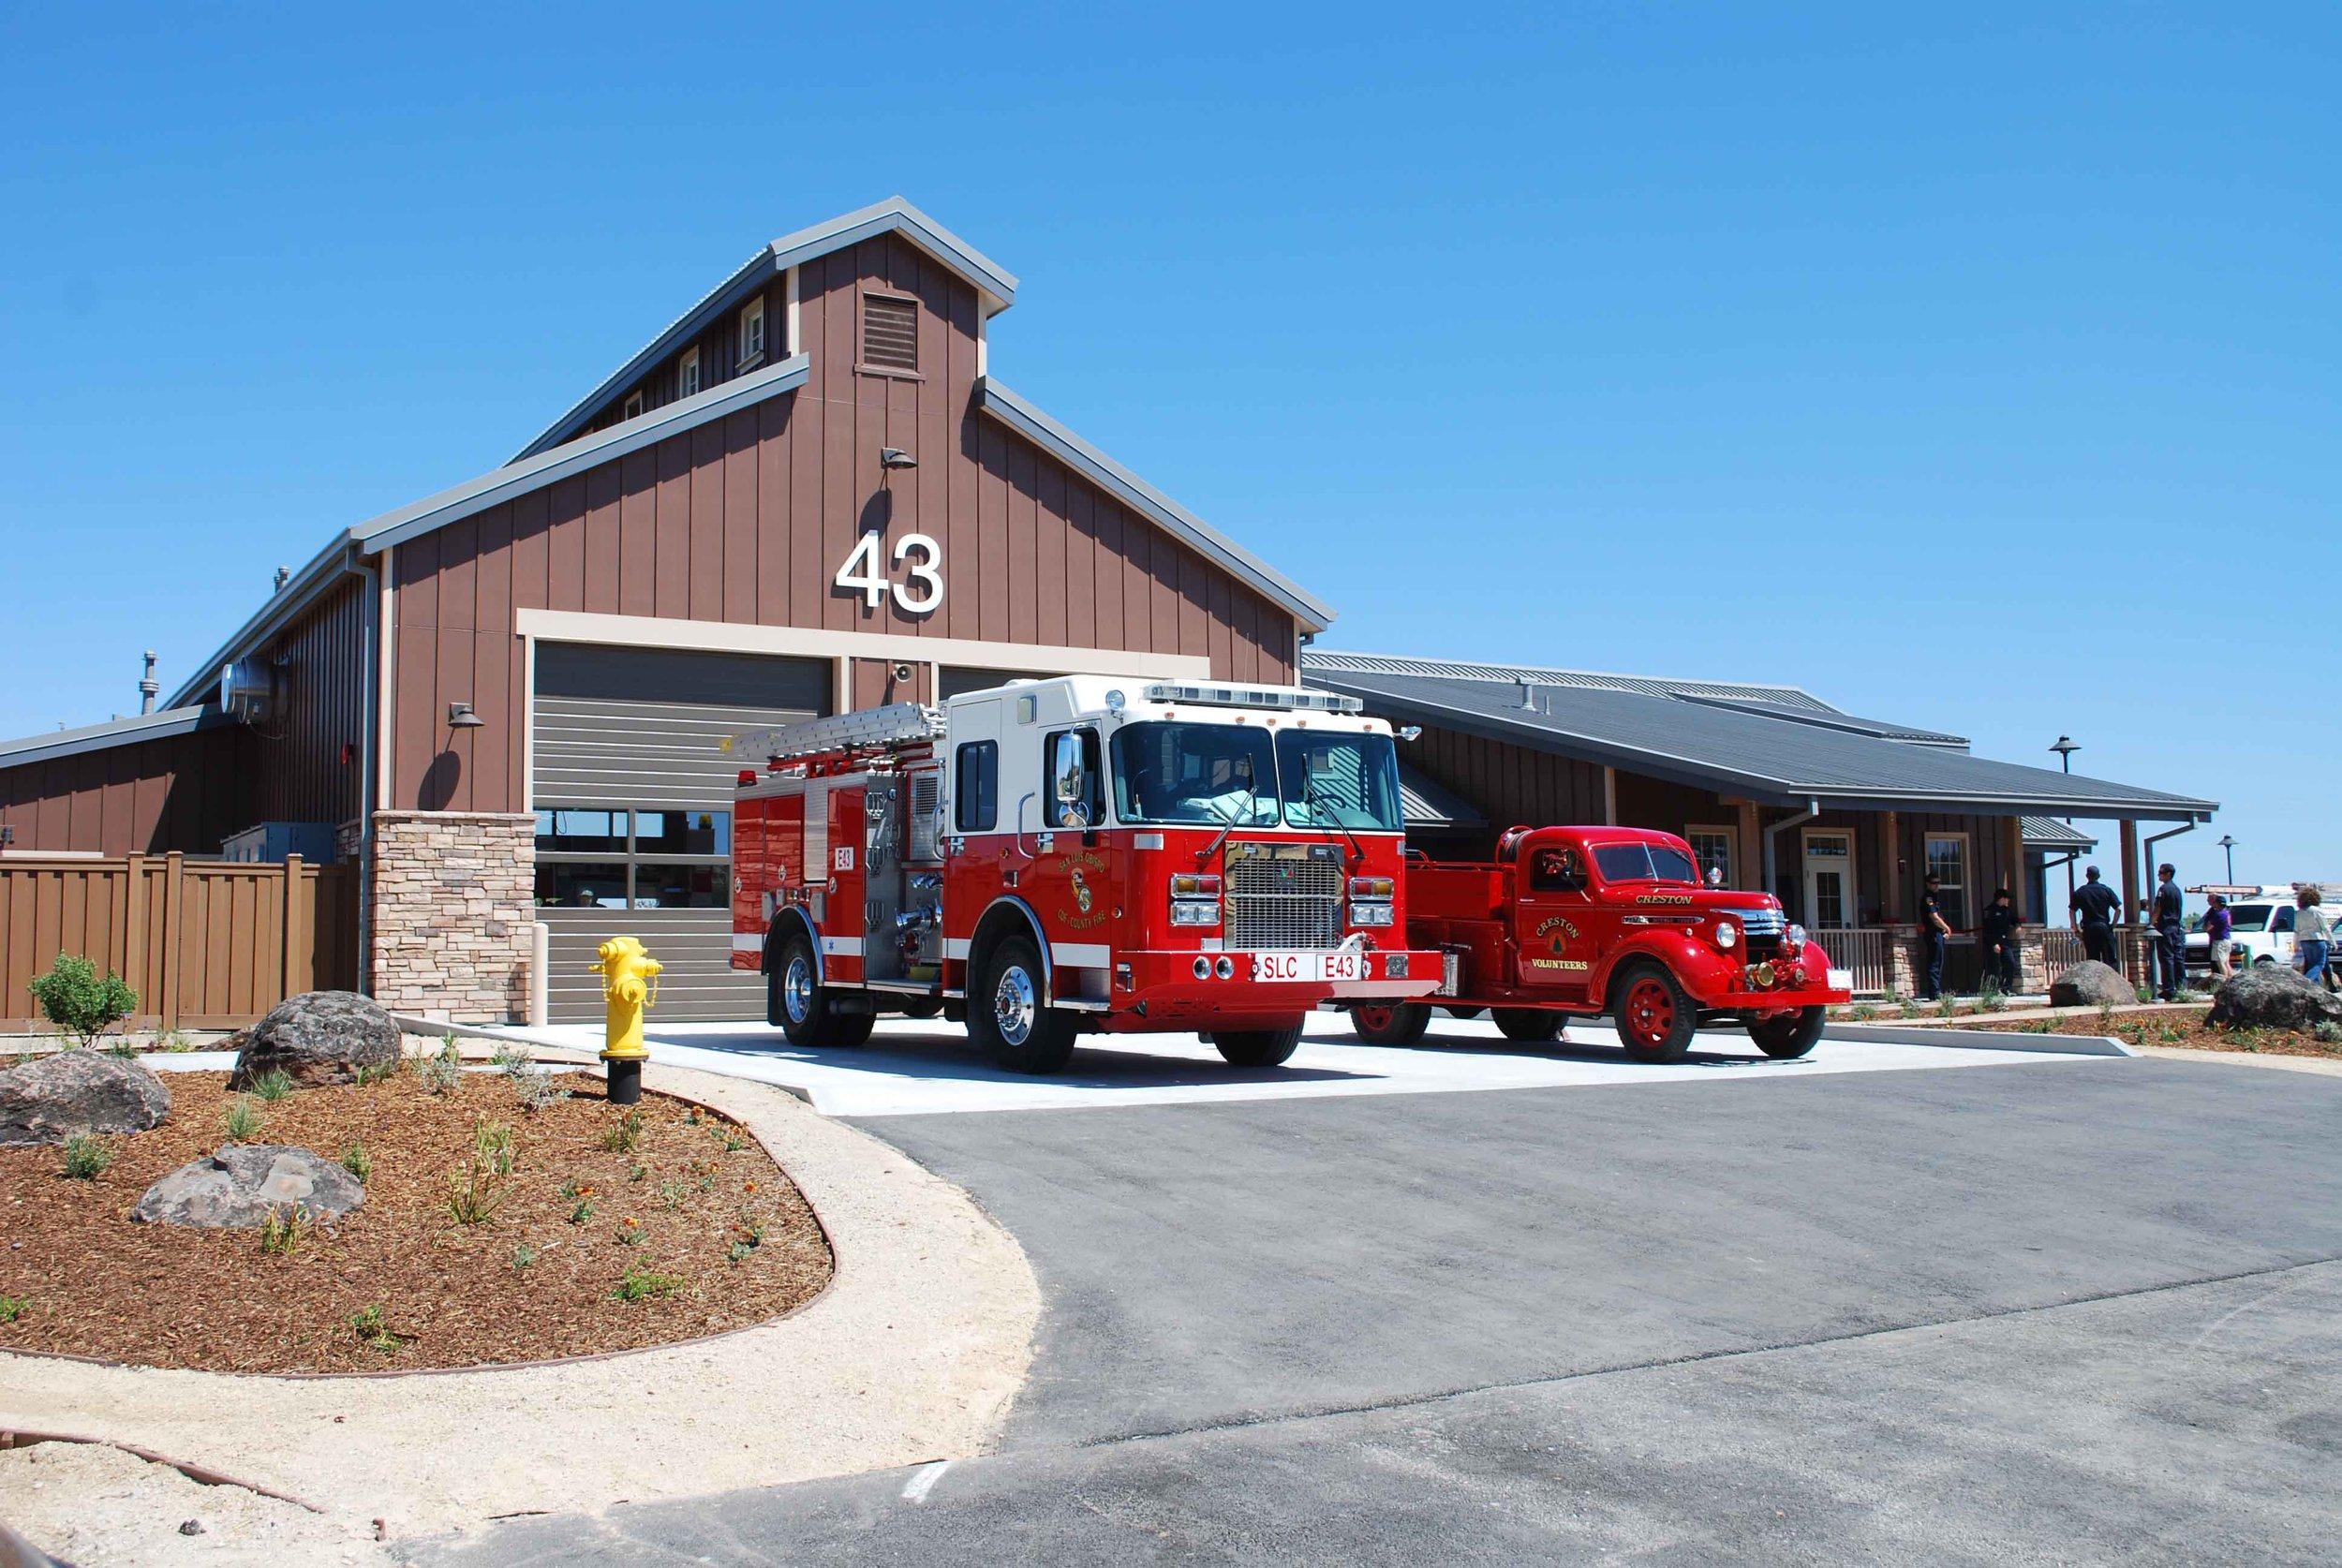 CRESTON FIRE STATION NO.43